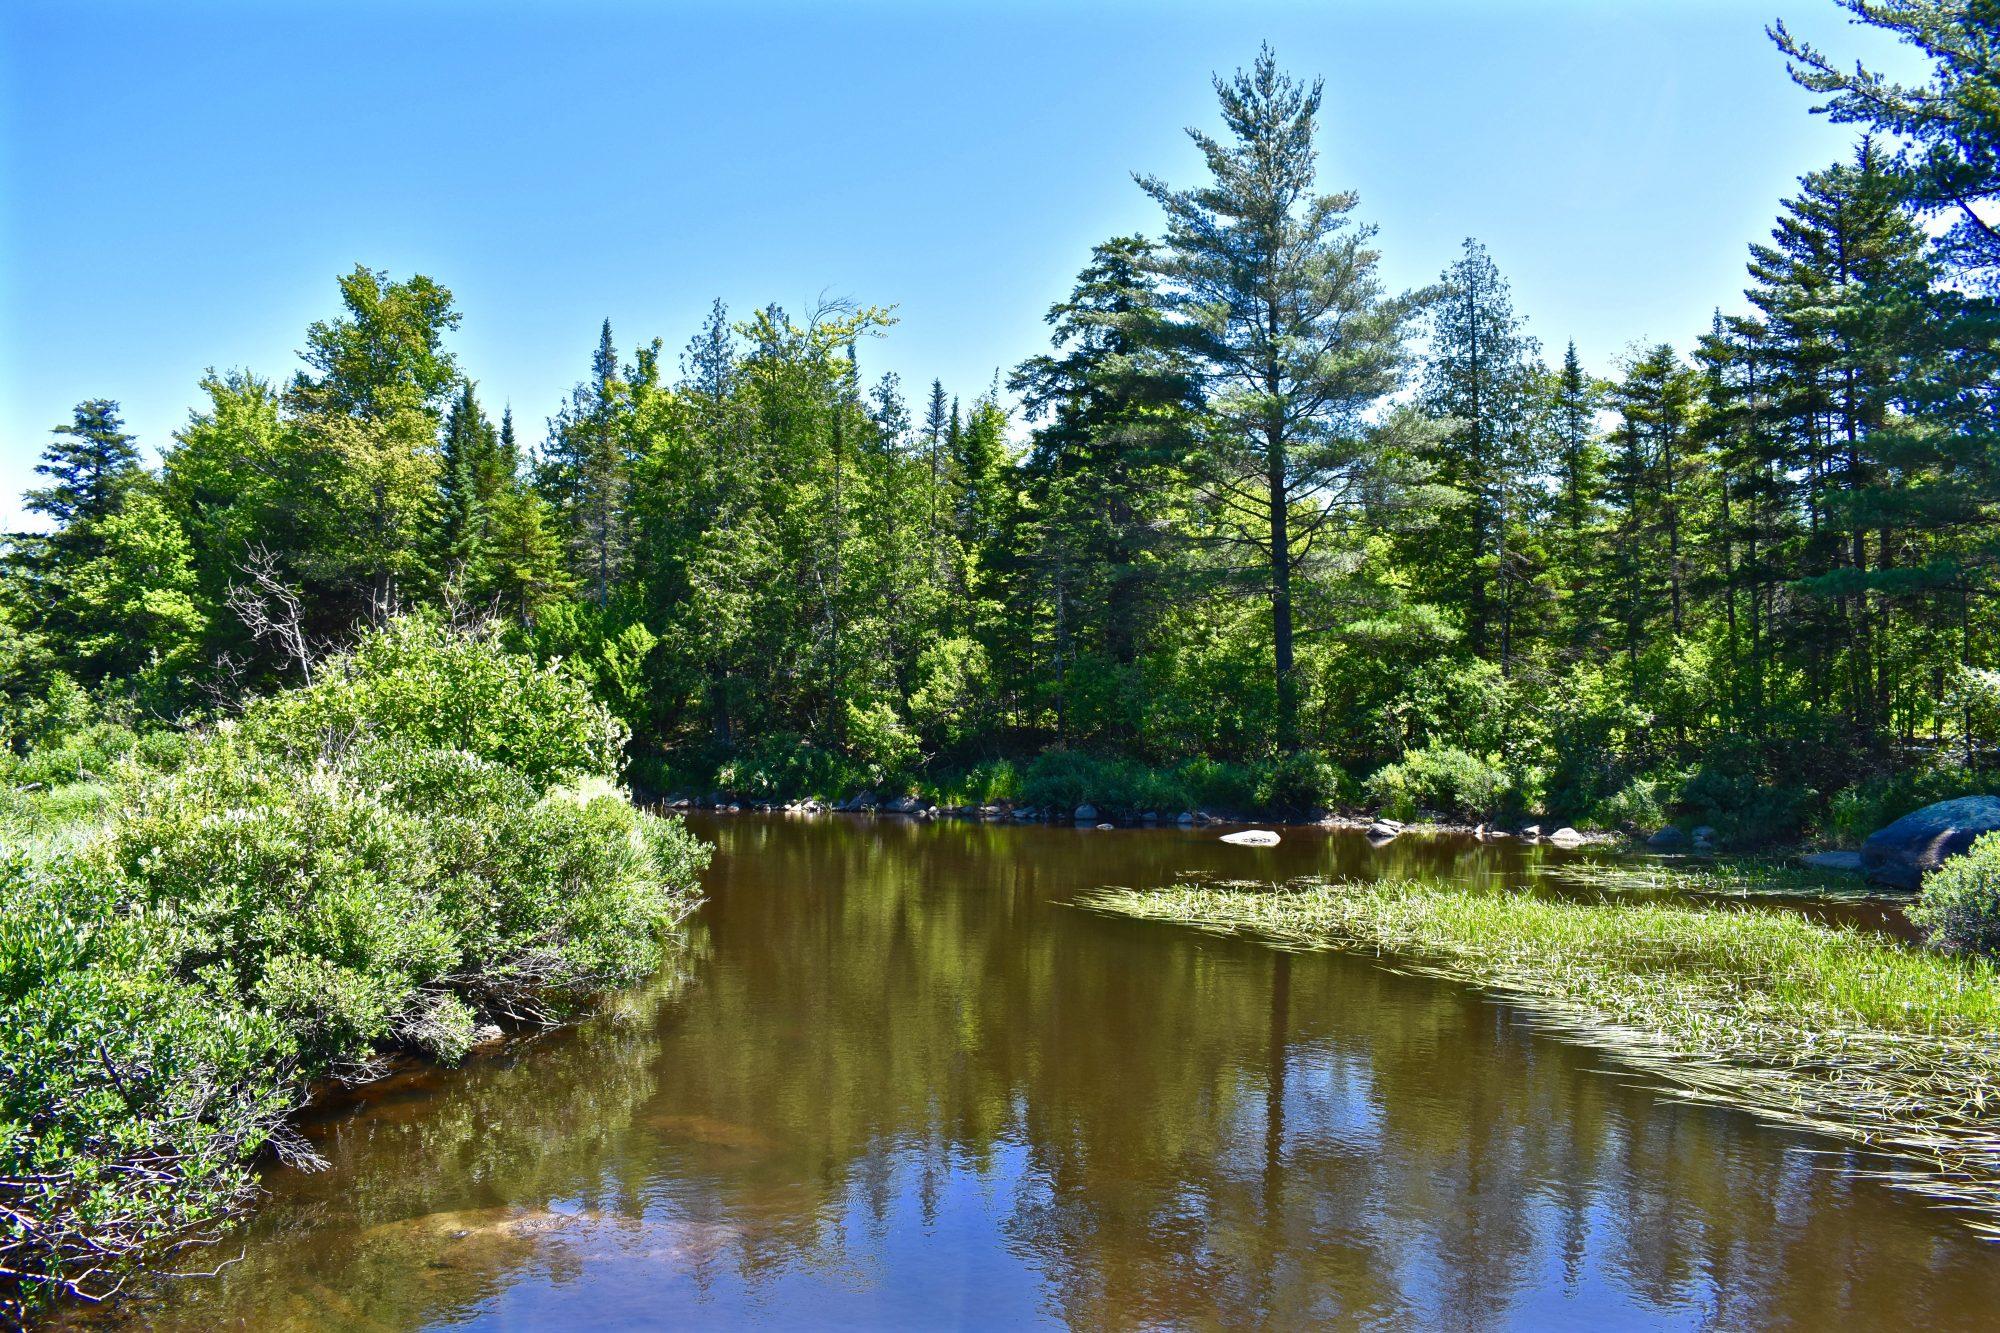 Brook- downstream